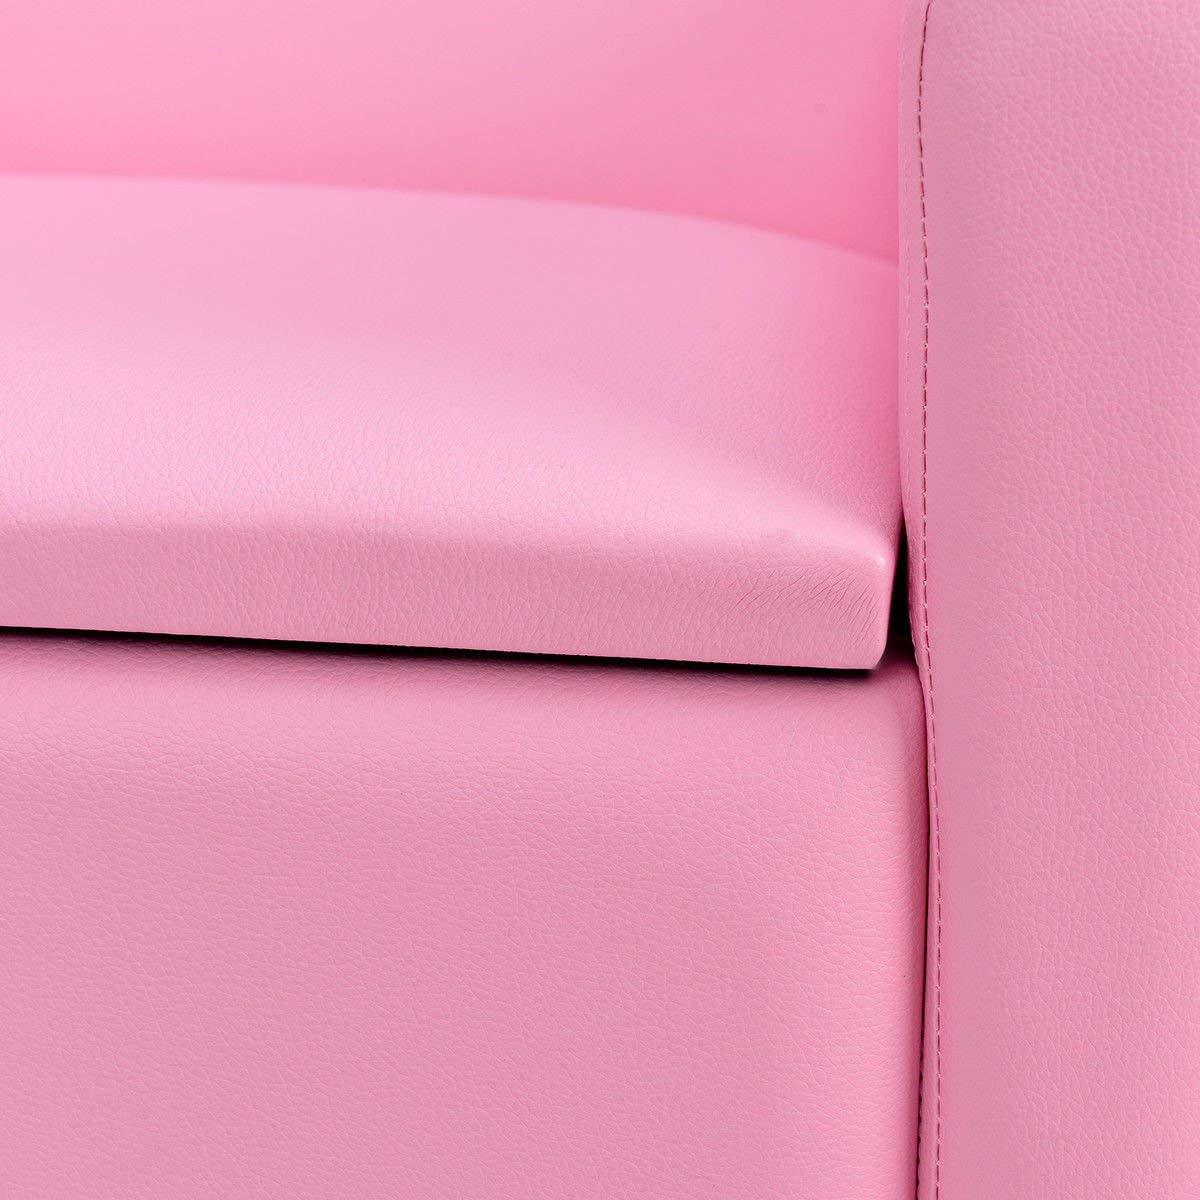 HONEY JOY Kids Sofa, Upholstered Armrest, Sturdy Wood Construction, Toddler Couch with Storage Box (Single Seat, Pink) by HONEY JOY (Image #6)